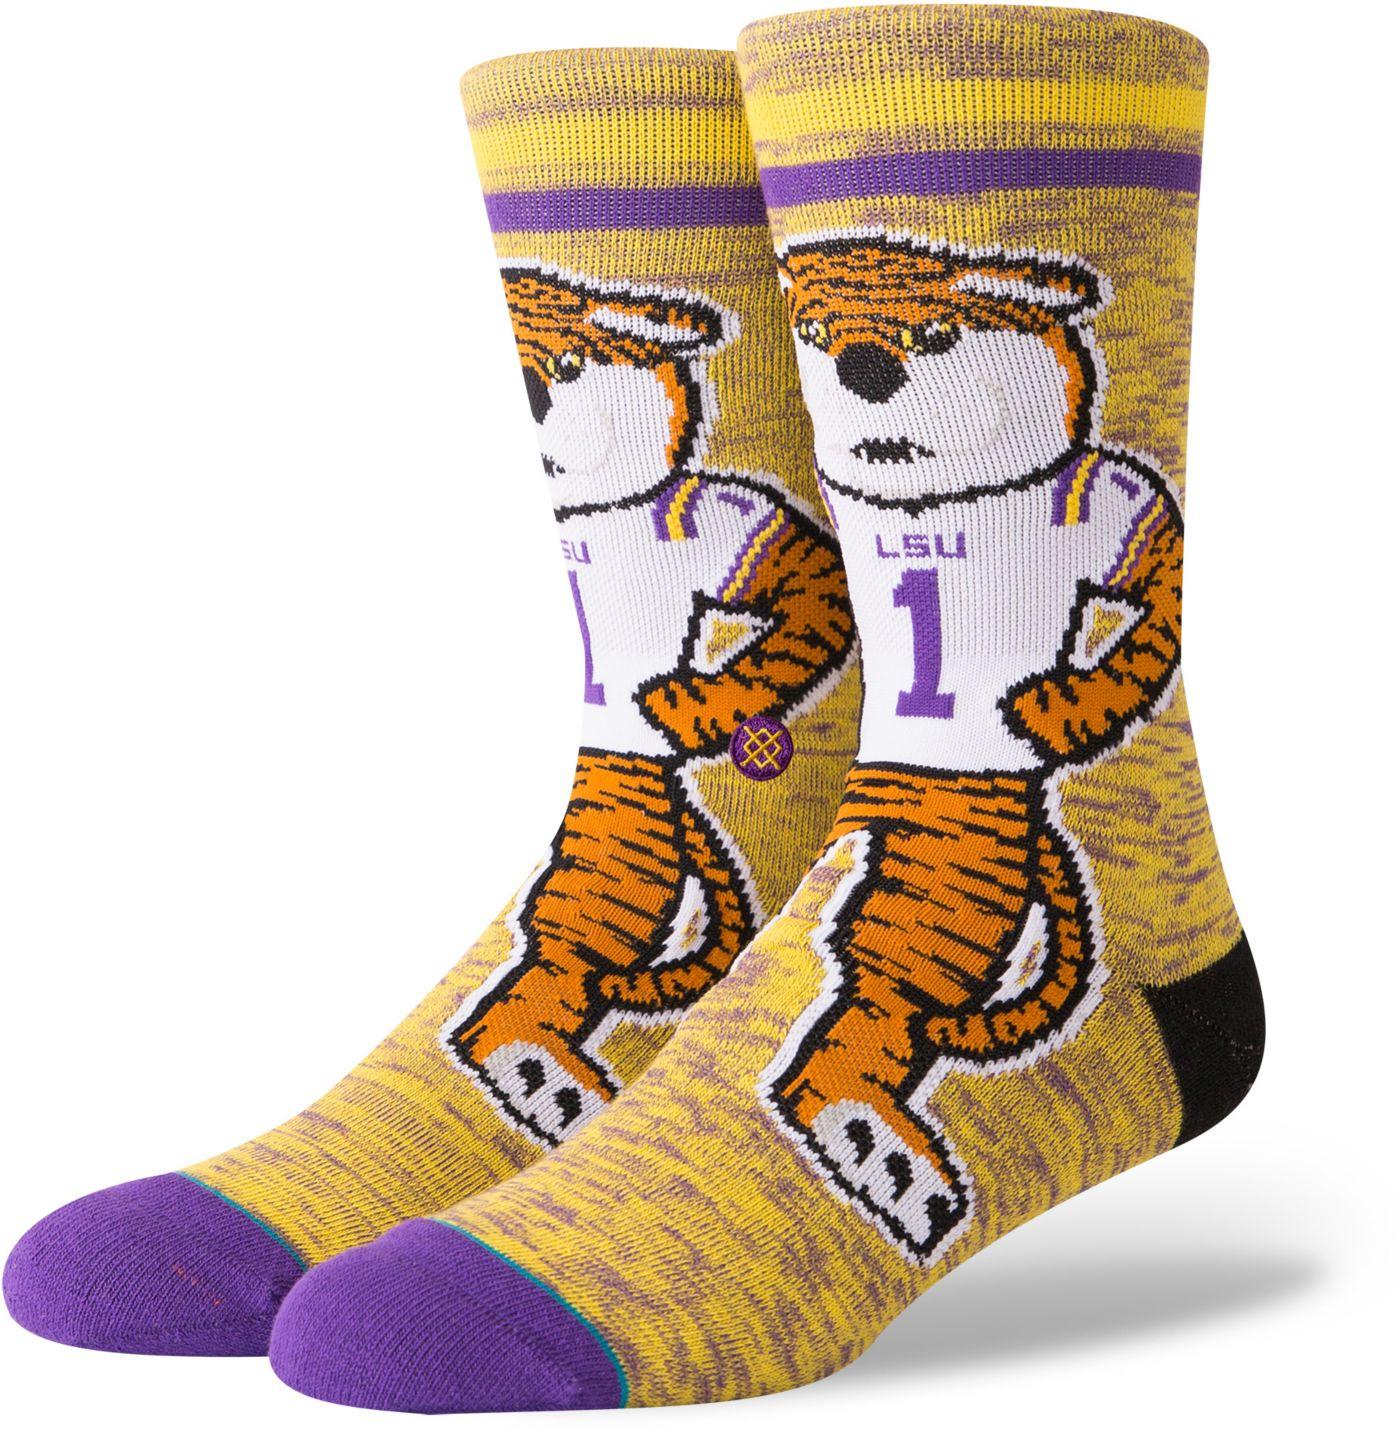 Stance Men's LSU Tigers Character Crew Socks